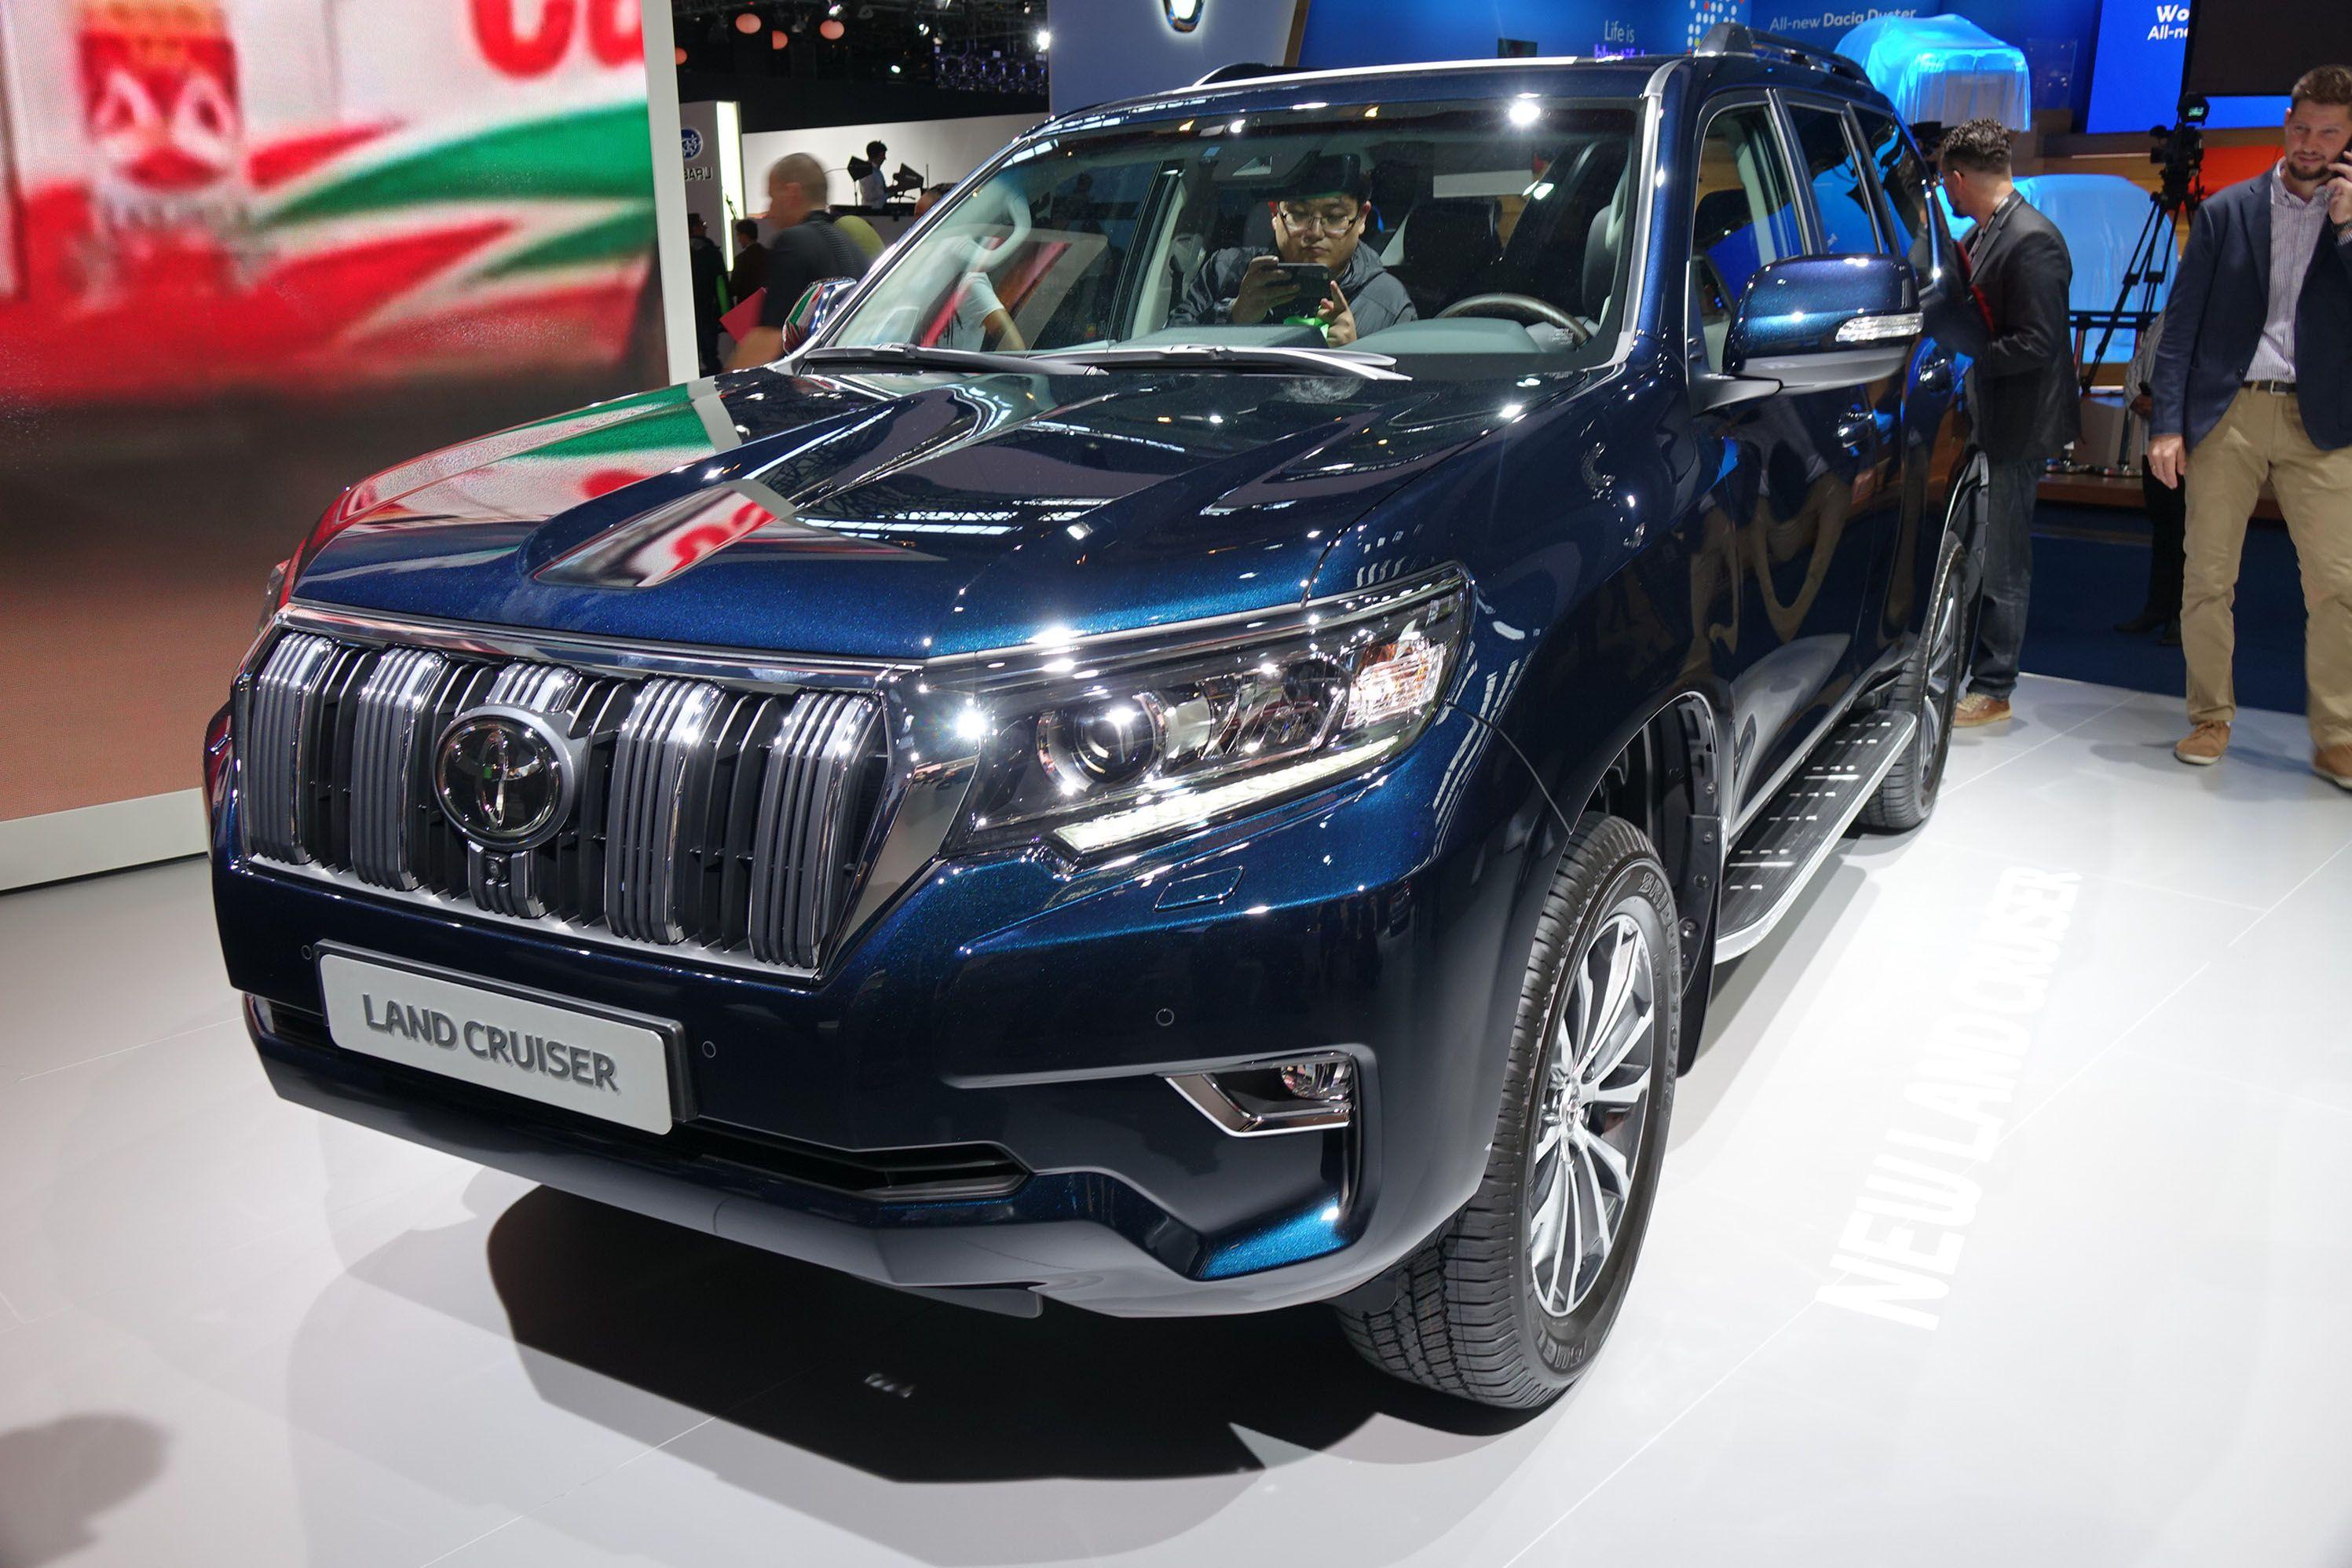 Best Look of New Landcruiser Prado 2019. Toyota land